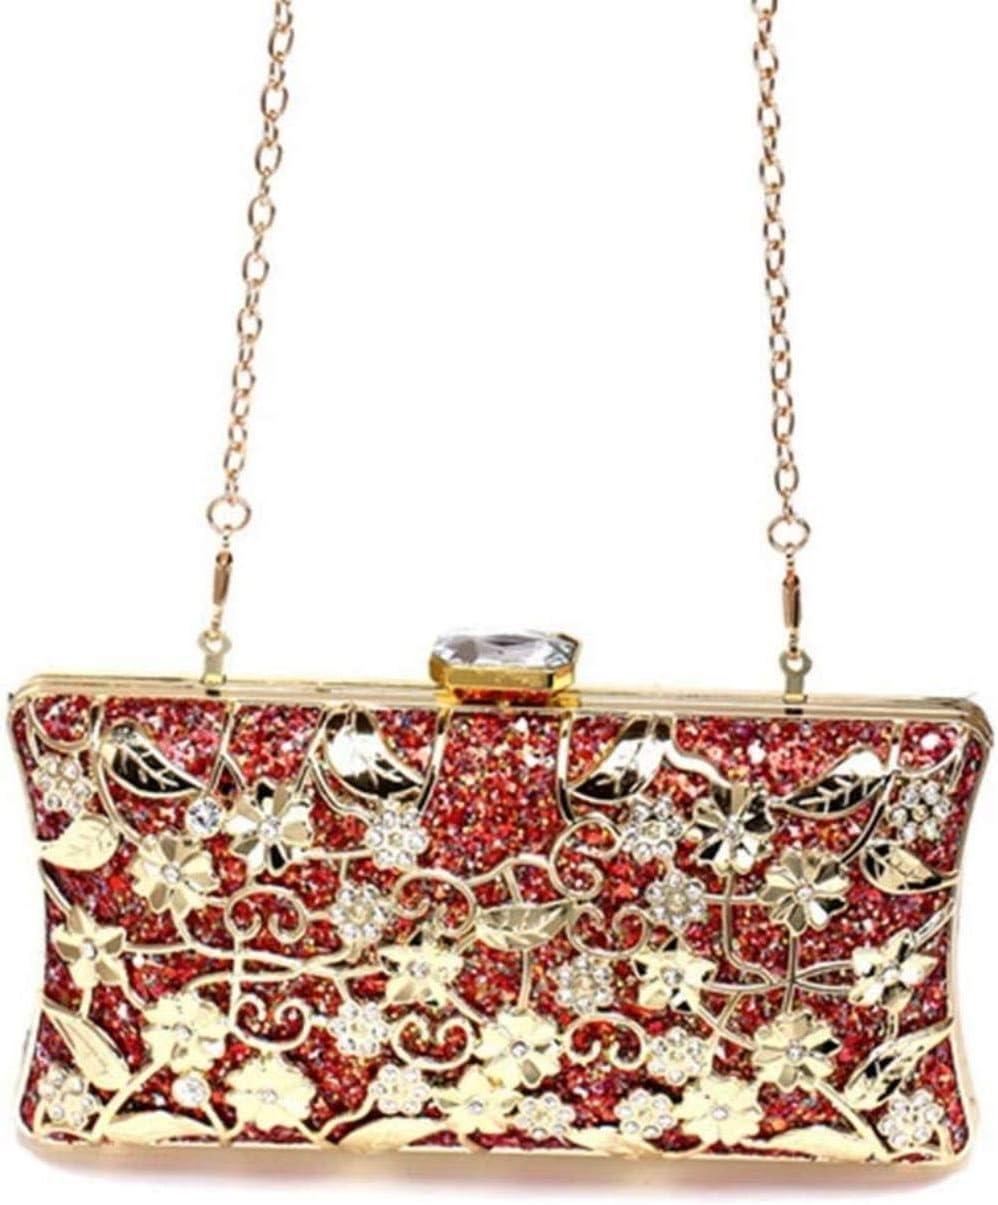 Women's Metal Sequins Evening Clutch Bag Hollow Pattern Banquet Bag Bridal Shoulder Handbag Crossbody Bags Red/Blue/Gold/Silver Beautiful Life Red),Colour:Blue (Color : Gold) Red